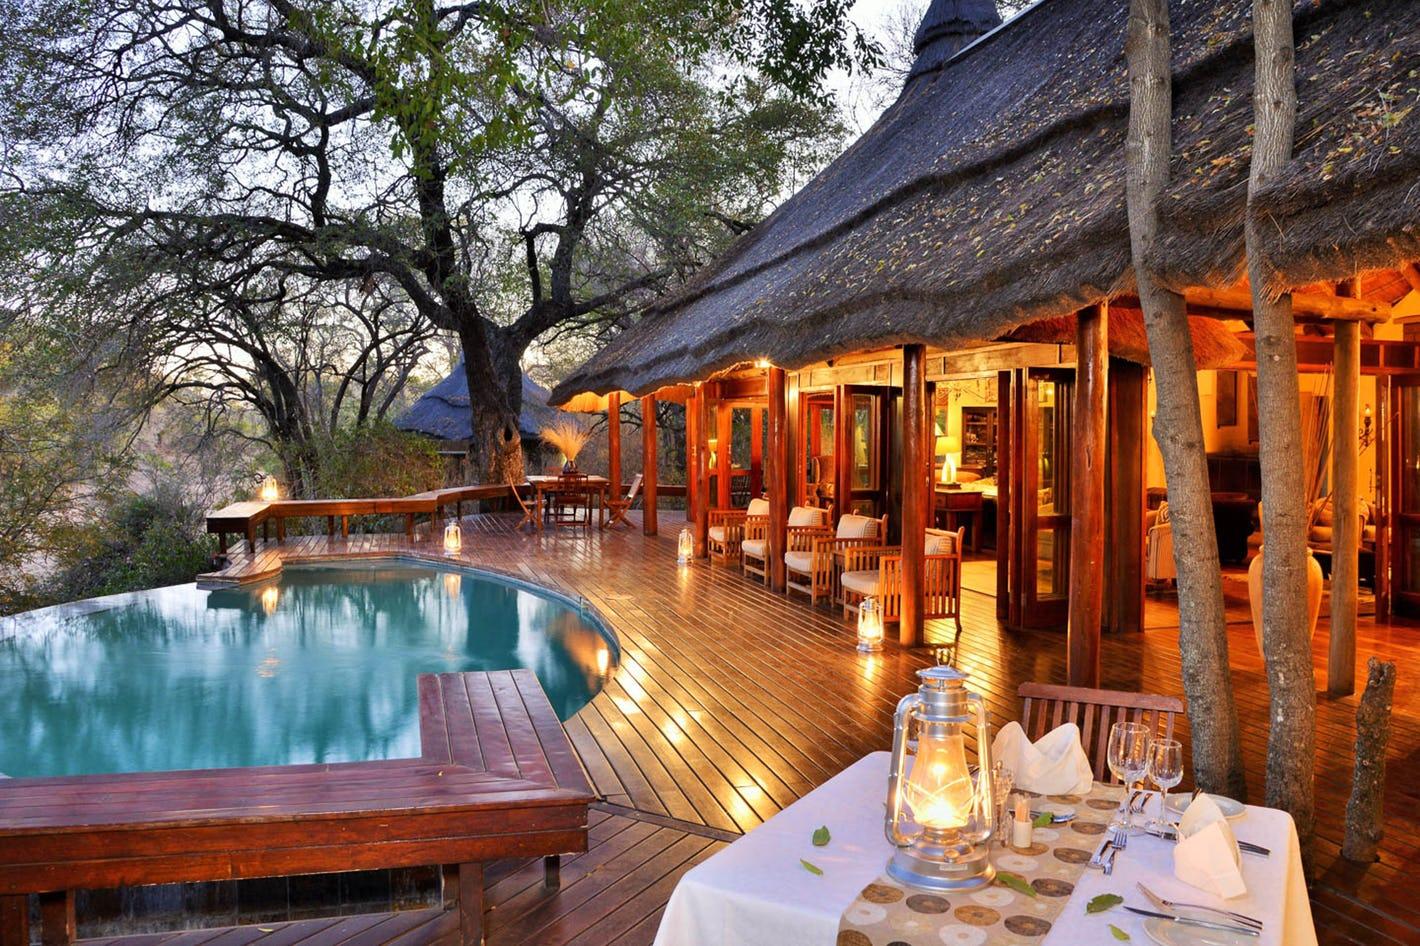 03 Days Imbali Lodge Safari